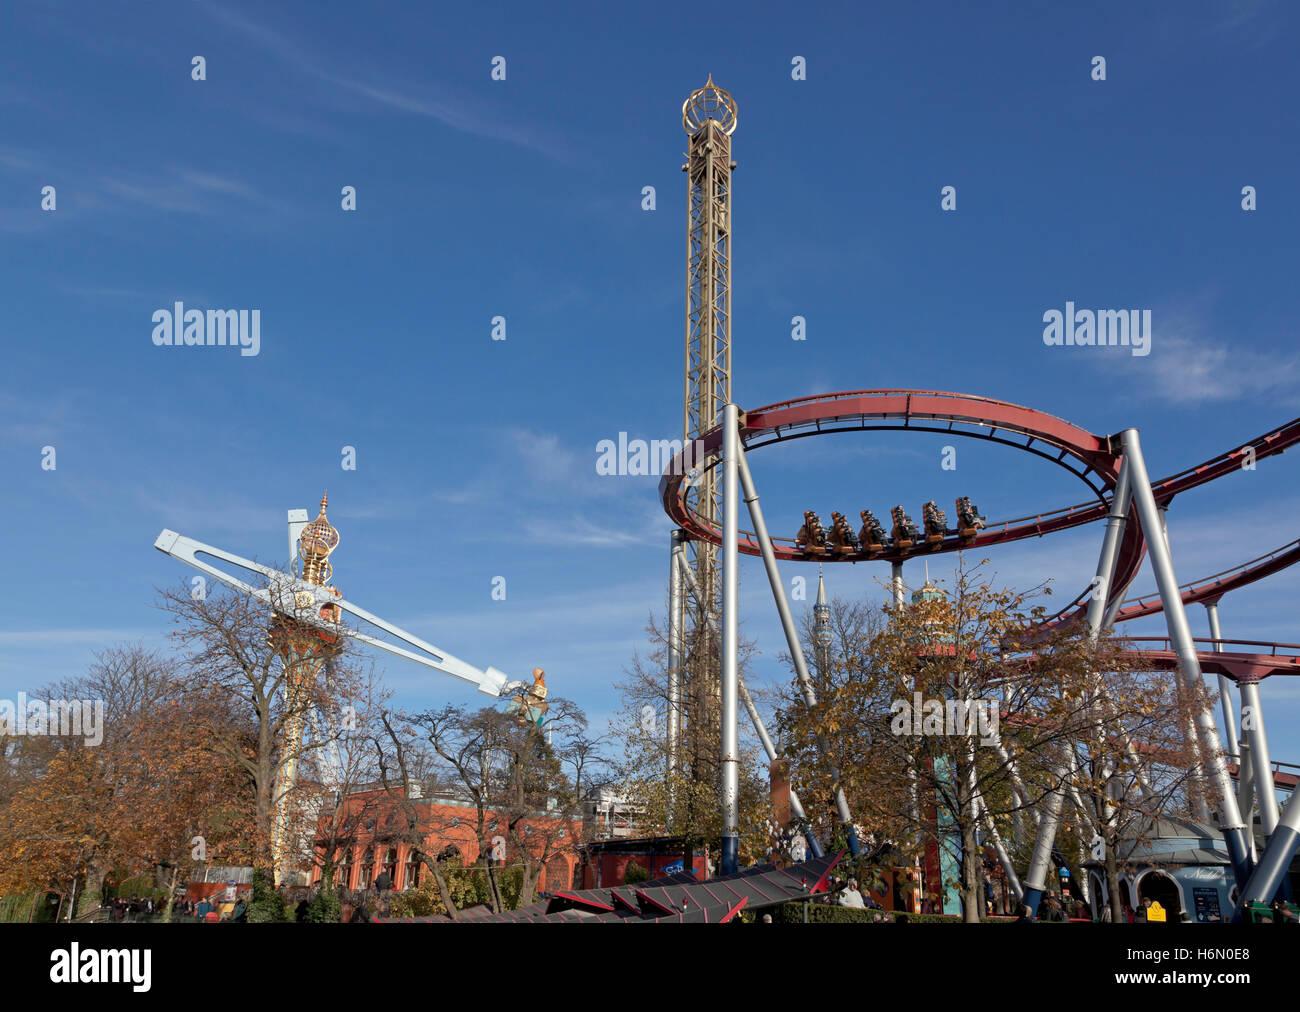 The Vertigo, the Golden Tower, and the Demon rides in Tivoli Gardens in Copenhagen on a sunny end October afternoon. - Stock Image